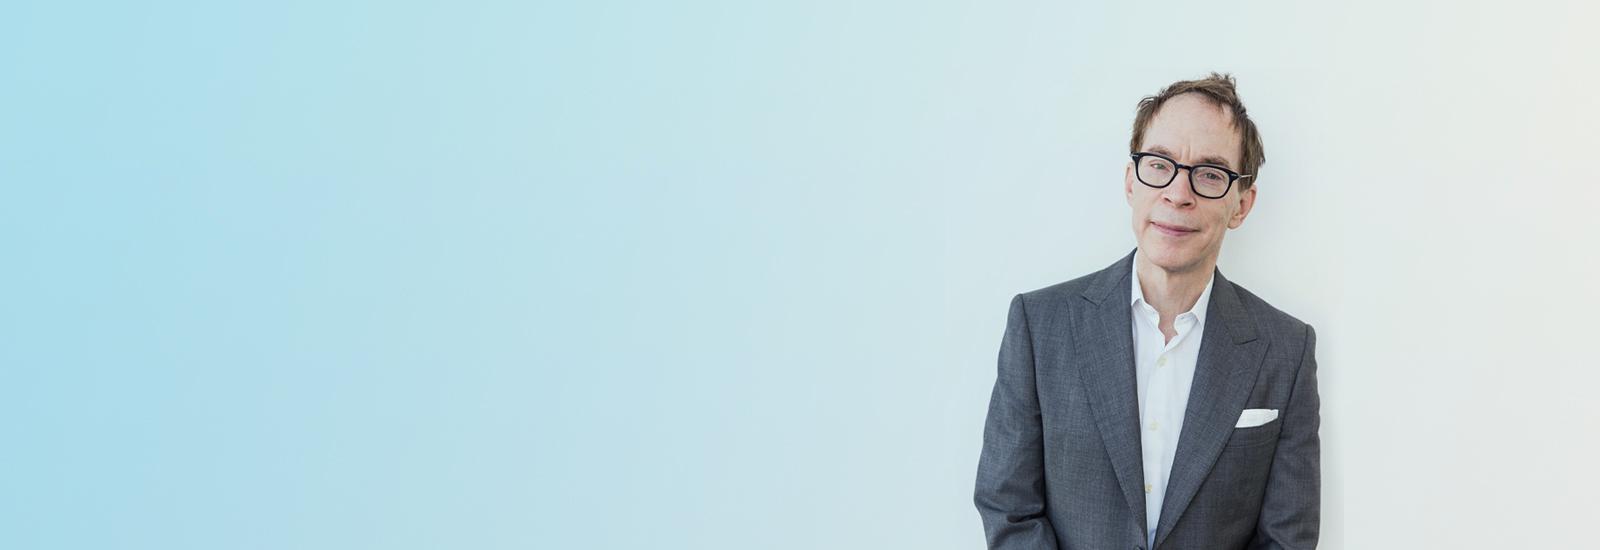 Vika Talks, Episode 1 – Adam Robinson